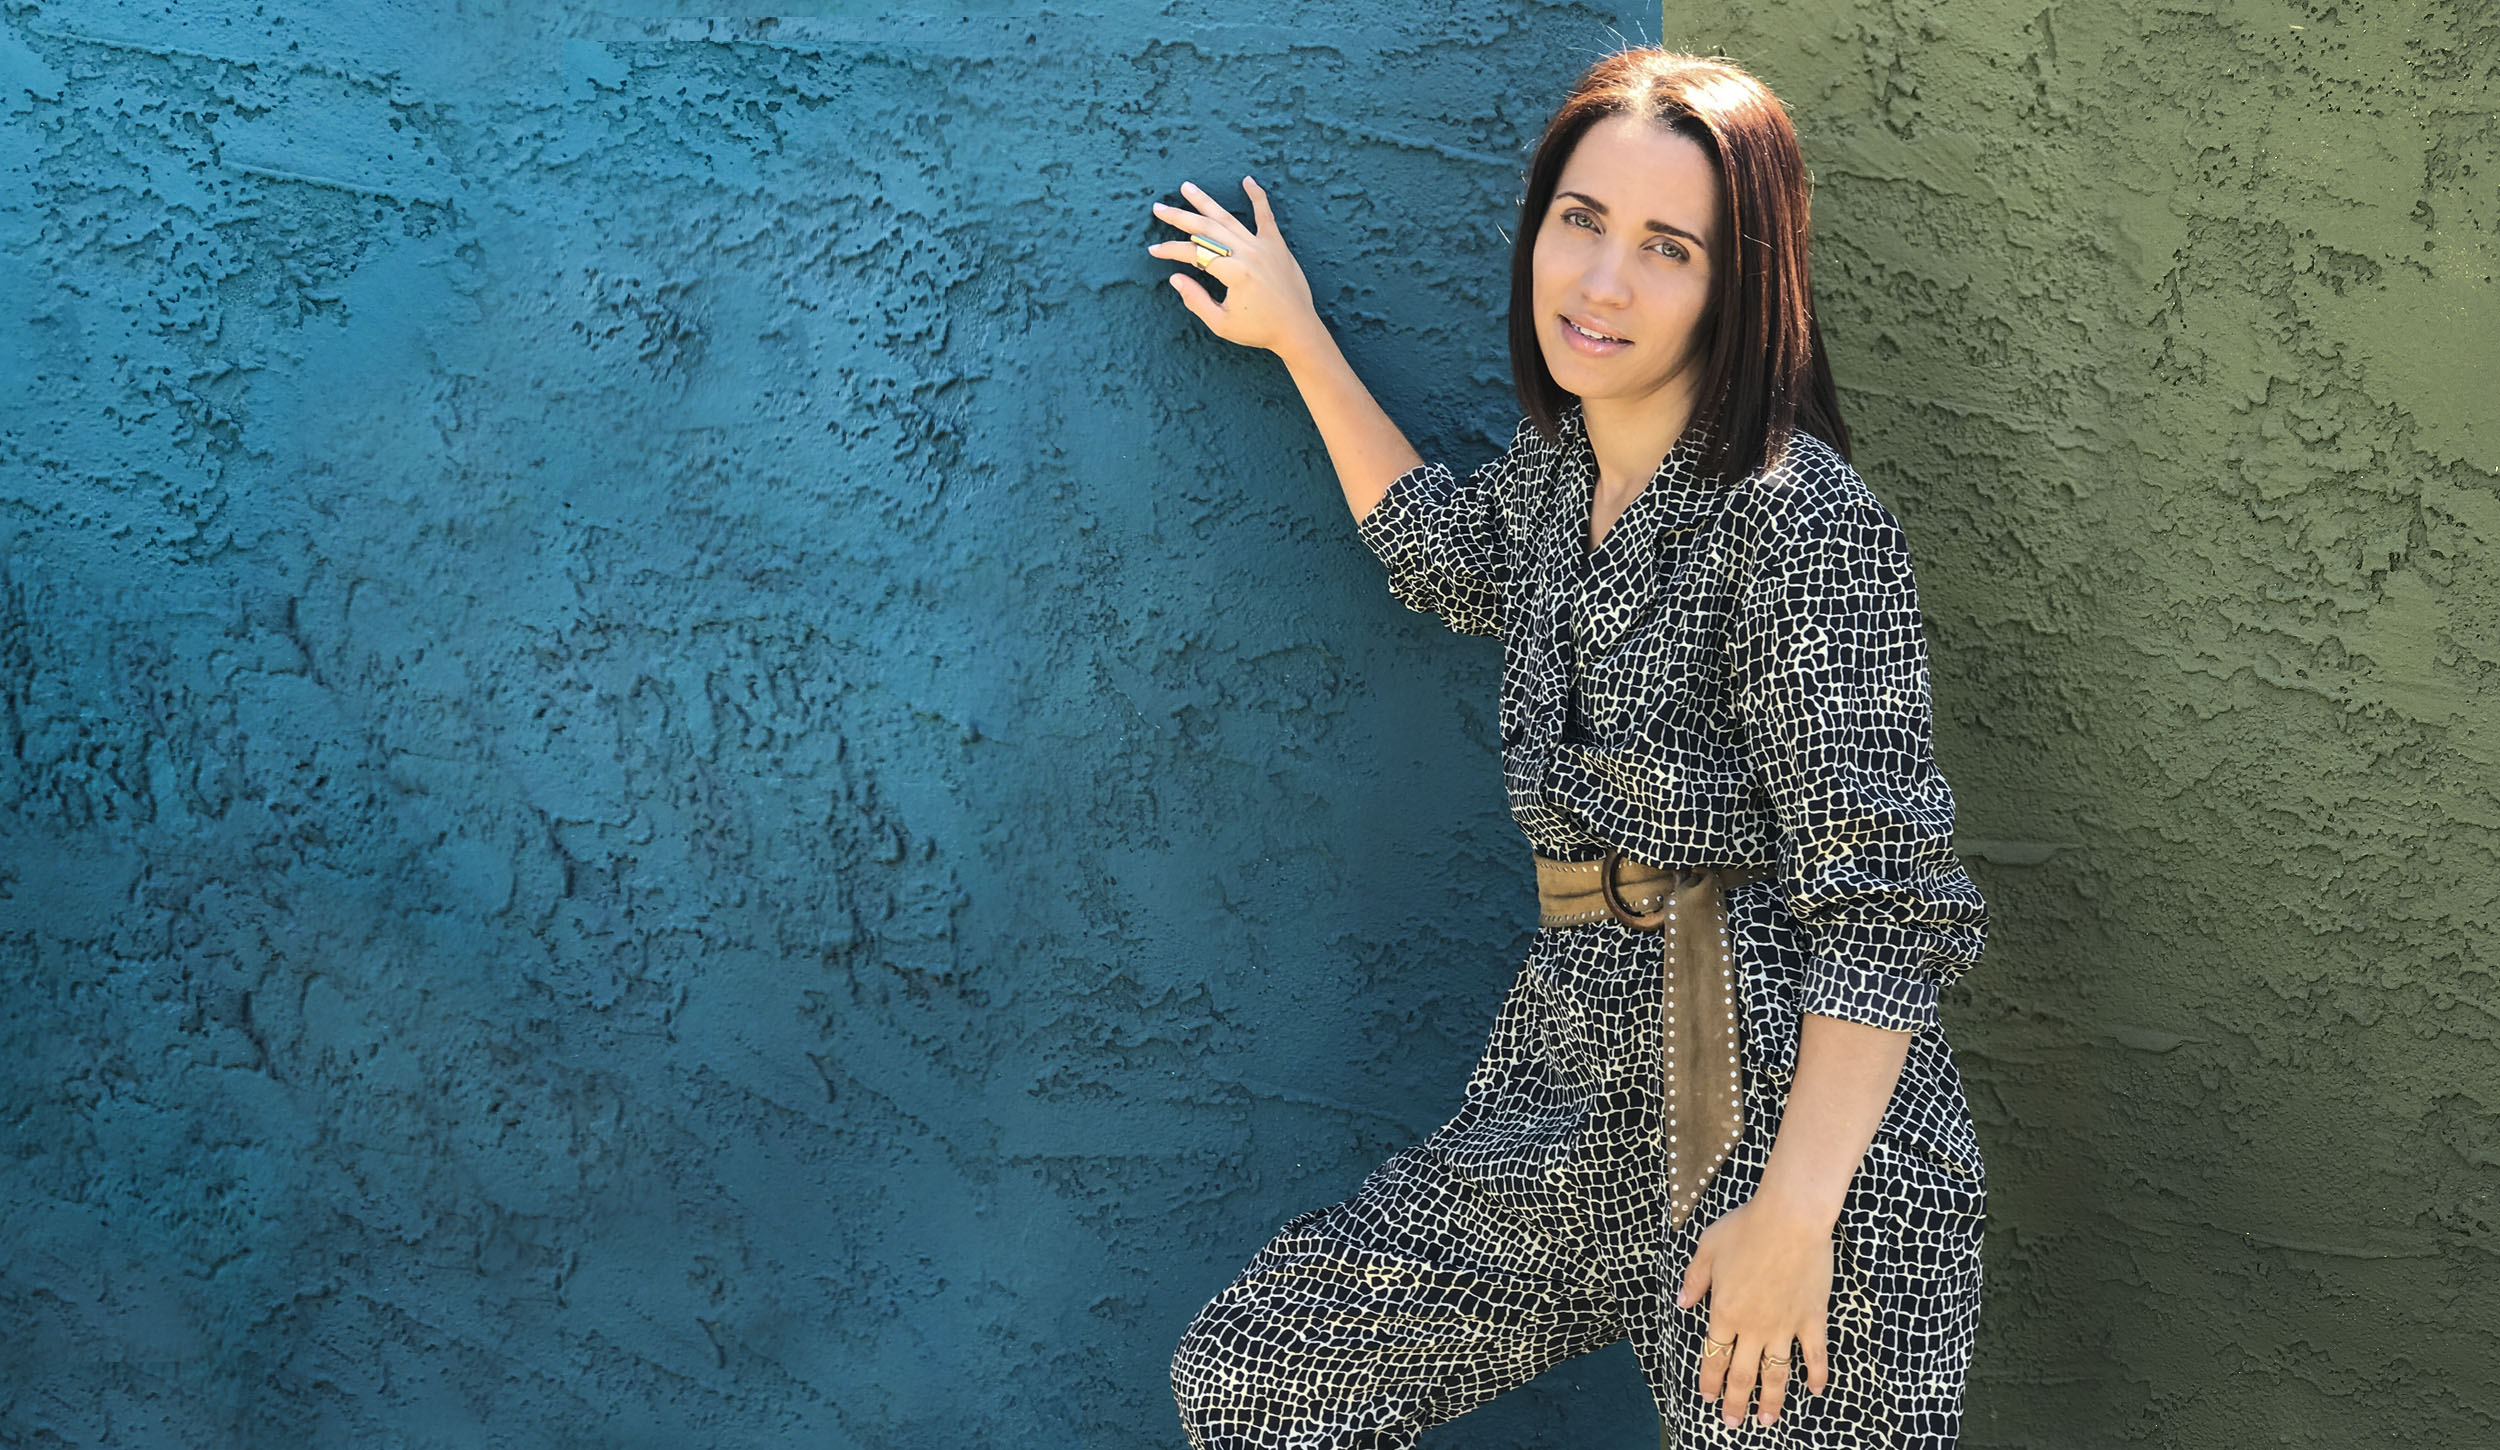 Serina-Morris-About-outdoor-smile_narrow.jpg